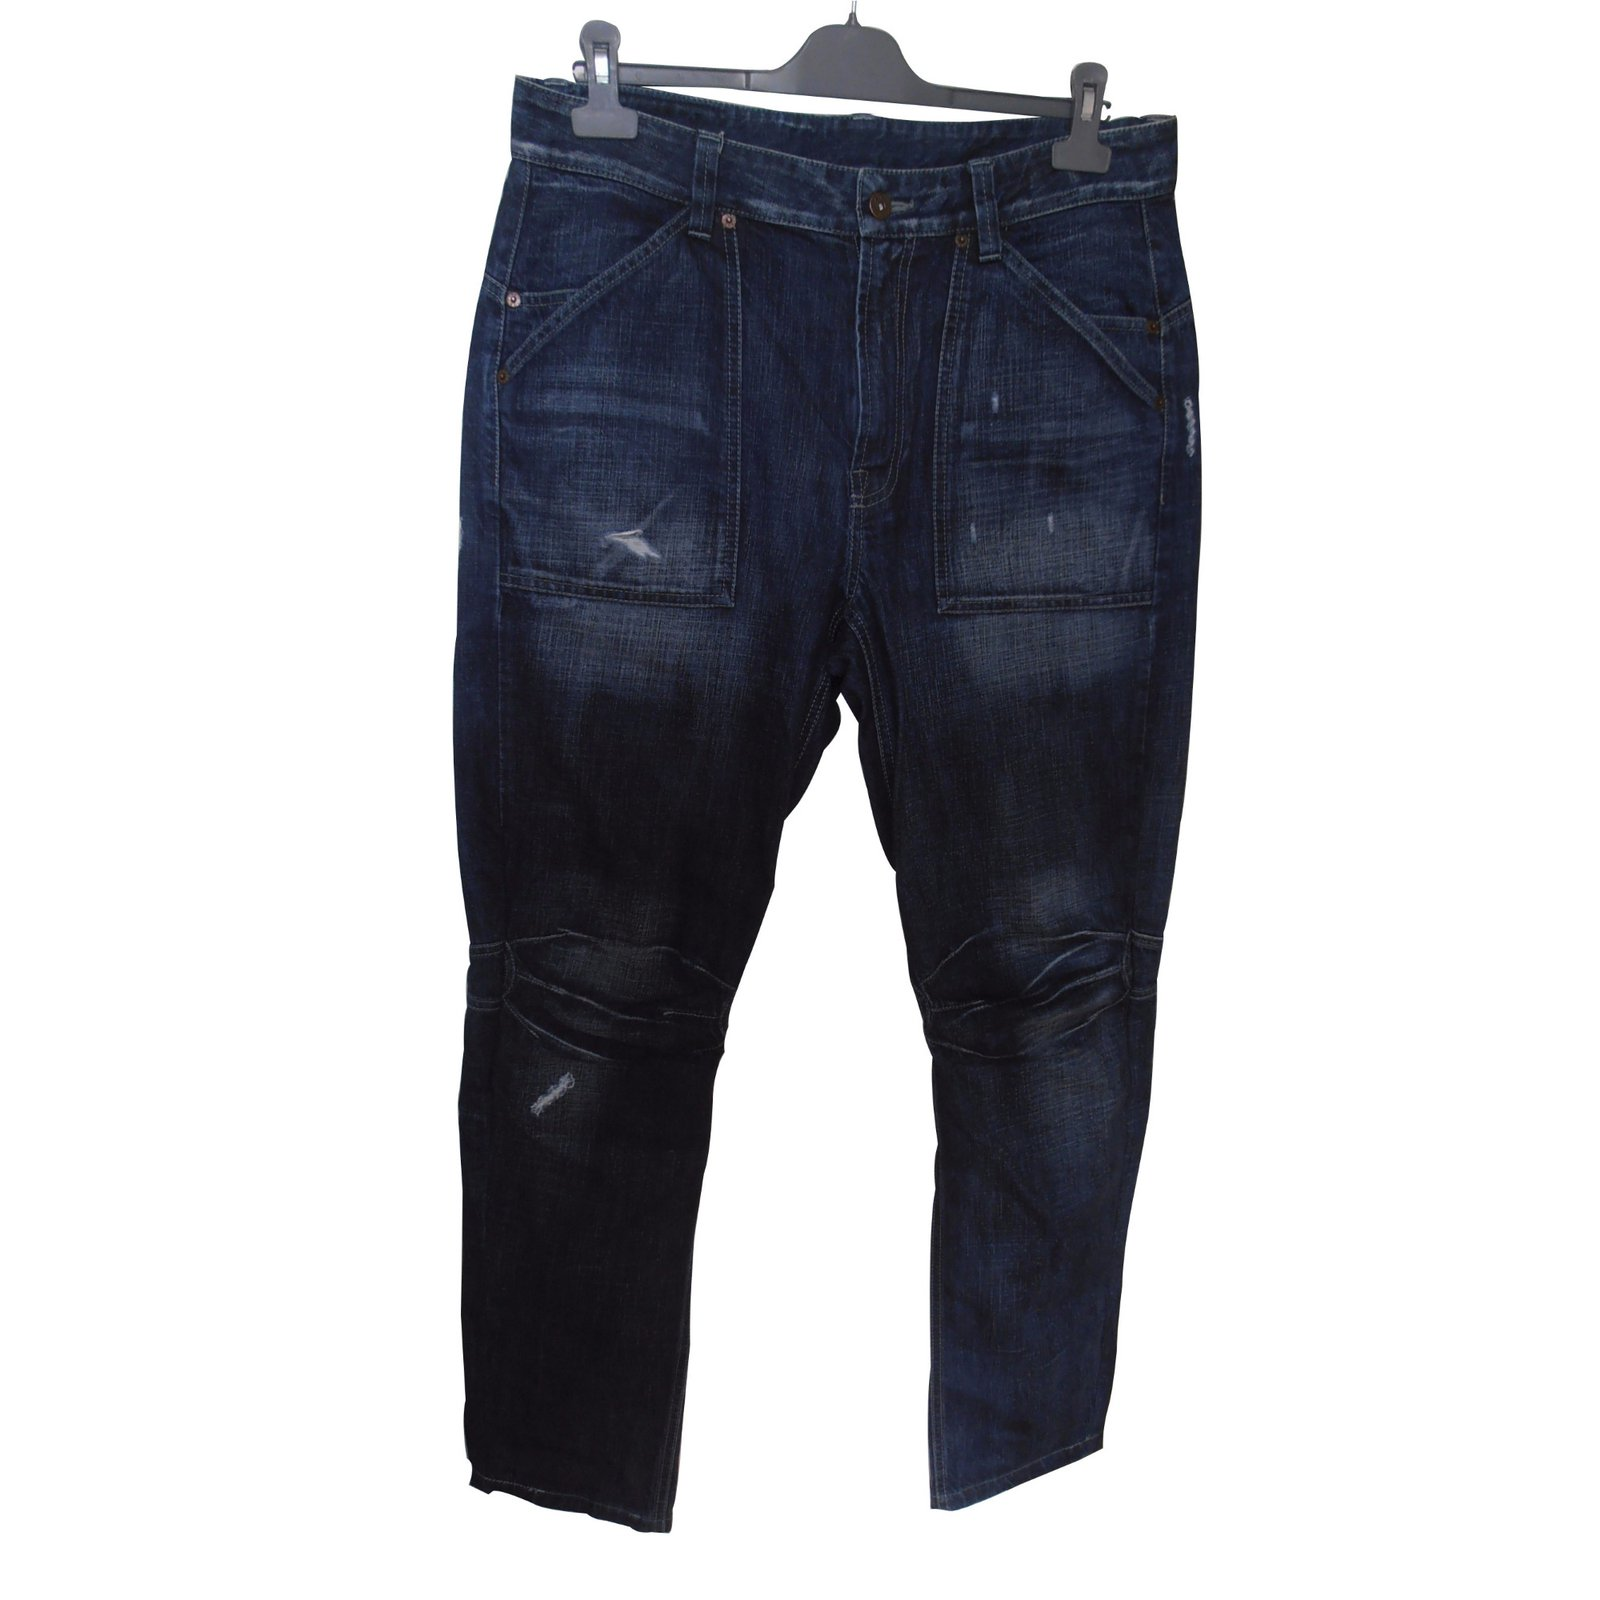 jeans homme kenzo large coton bleu joli closet. Black Bedroom Furniture Sets. Home Design Ideas